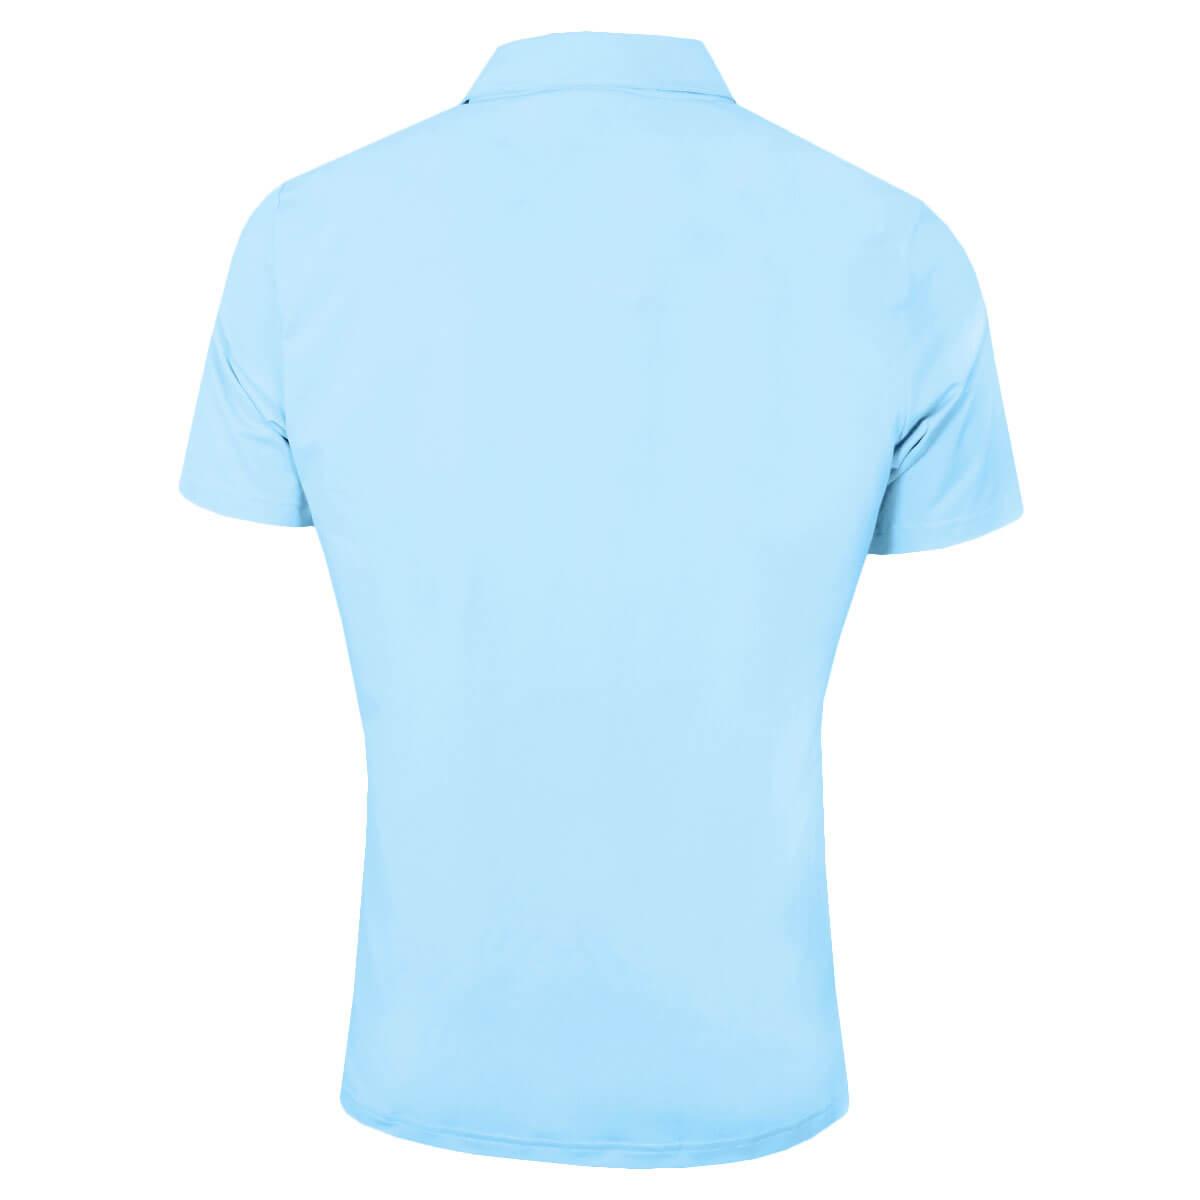 Adidas-Golf-Men-039-s-Ultimate-2-0-Solid-Crestable-Polo-Shirt thumbnail 7